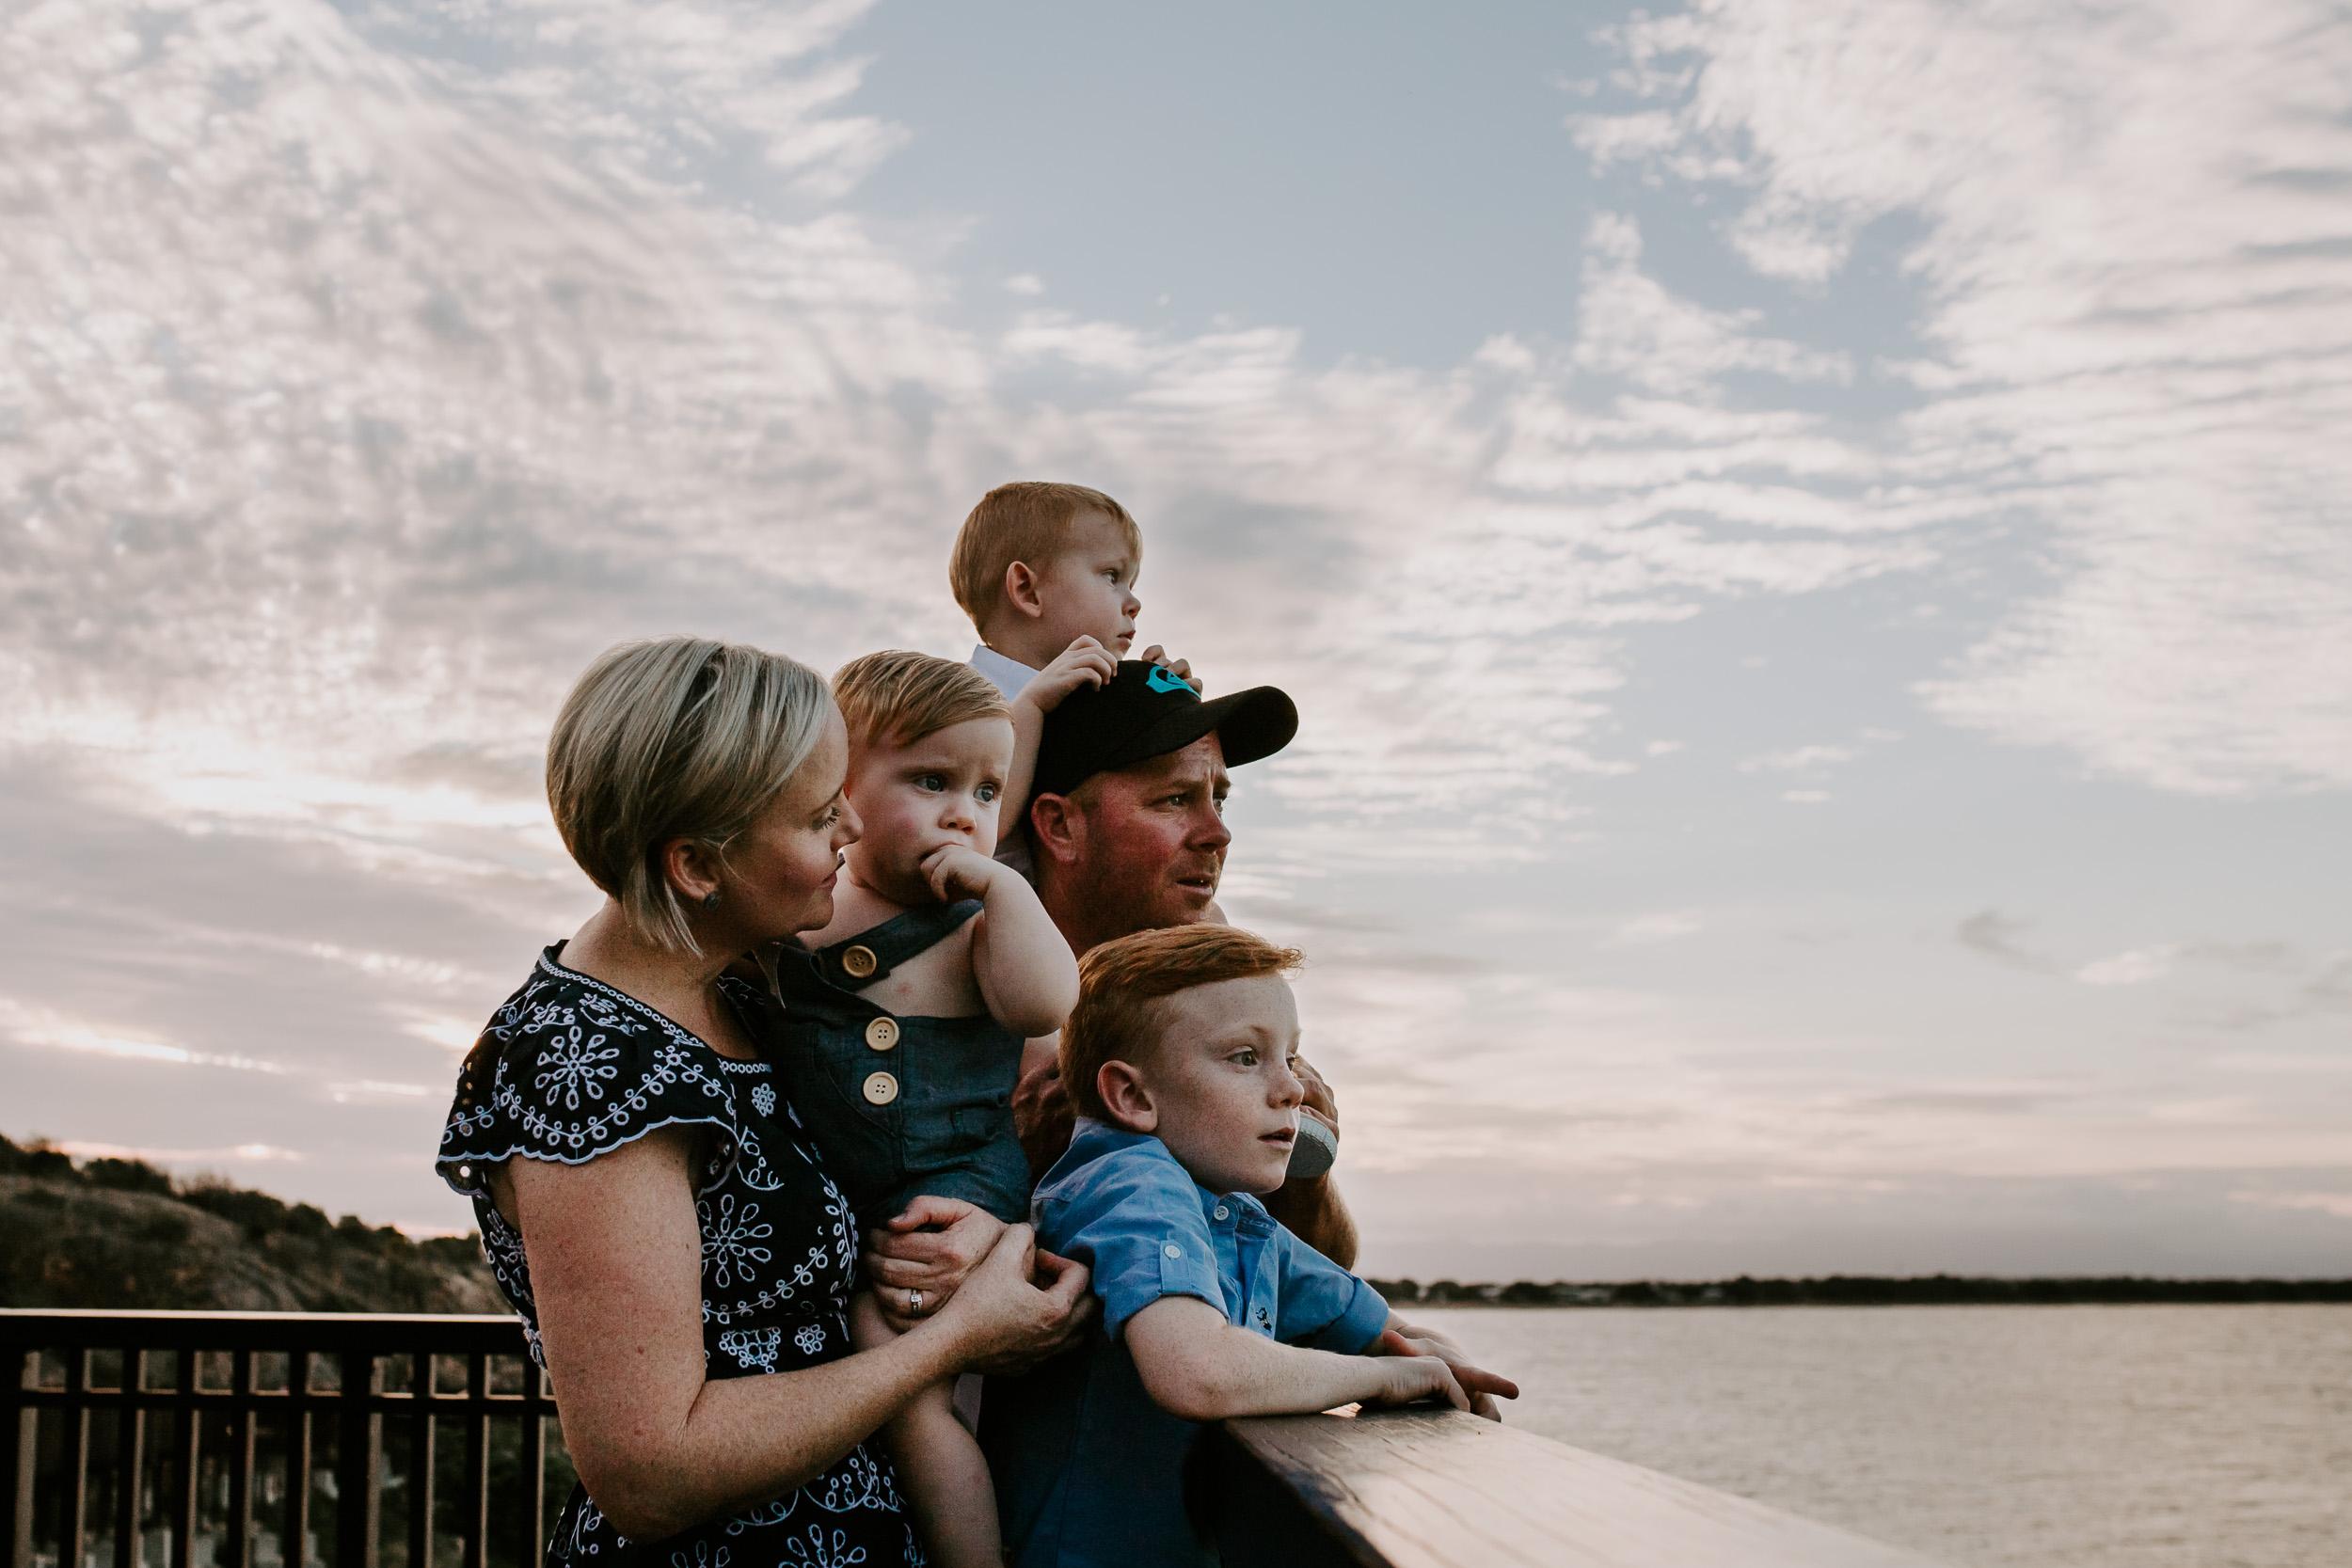 outdoor-family-lifetsyle-townsville-photographer-77.jpg